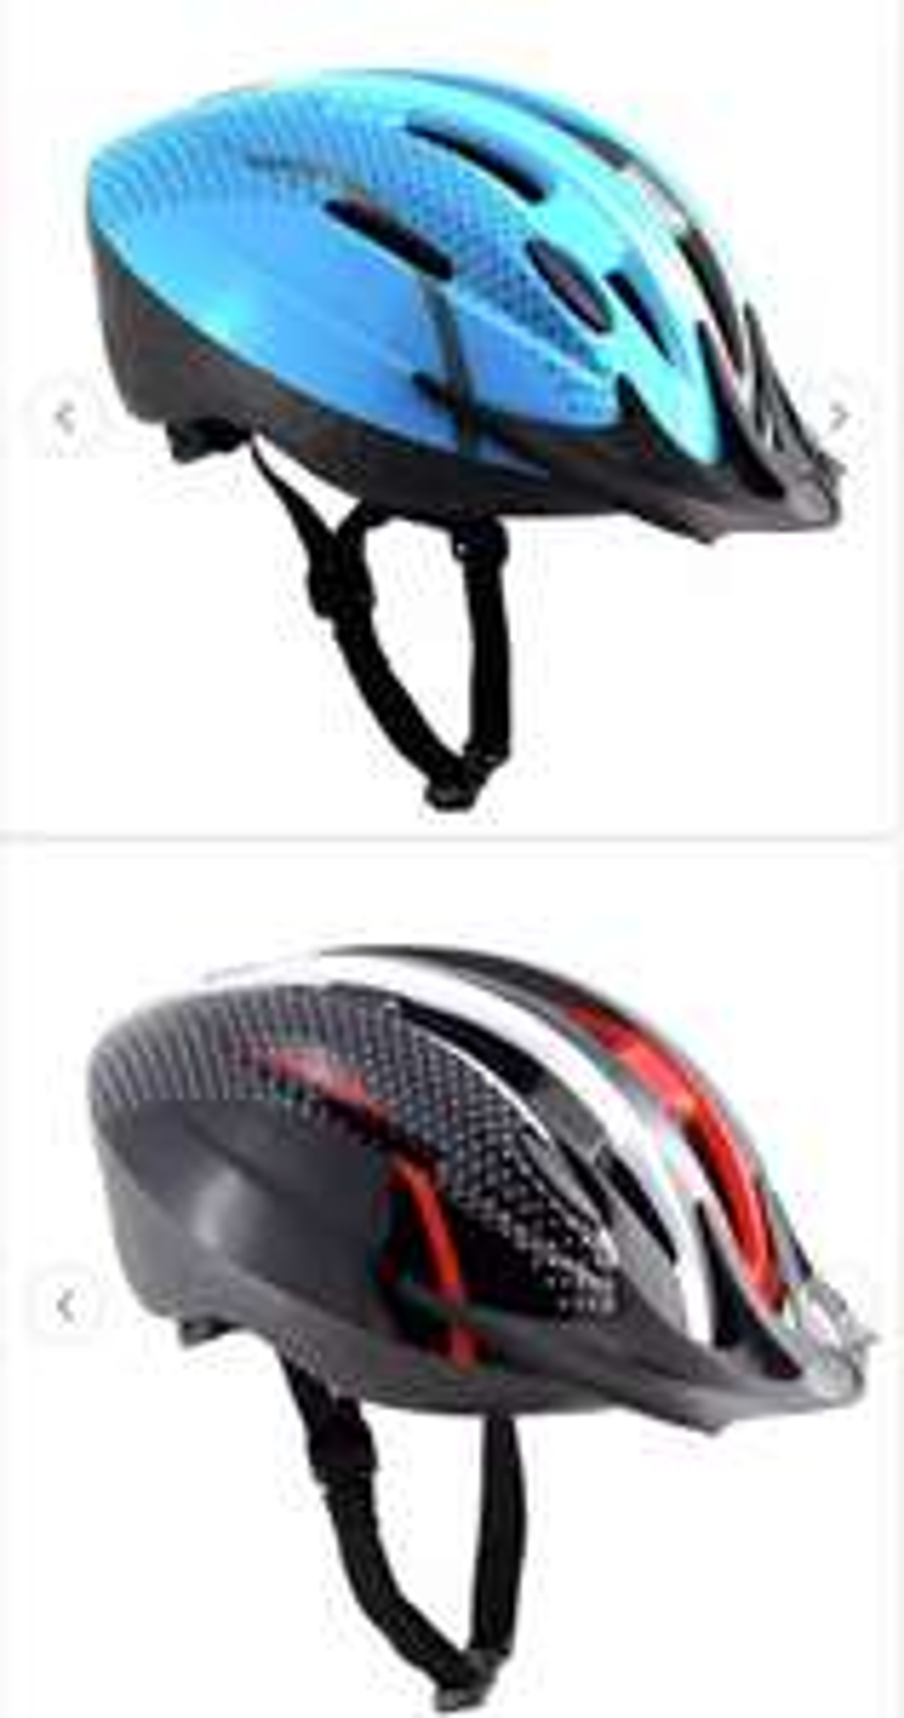 Kids Challenge Kids Bike Helmet Now £6.49 Red or Blue Delivery is £3.95 @ Argos